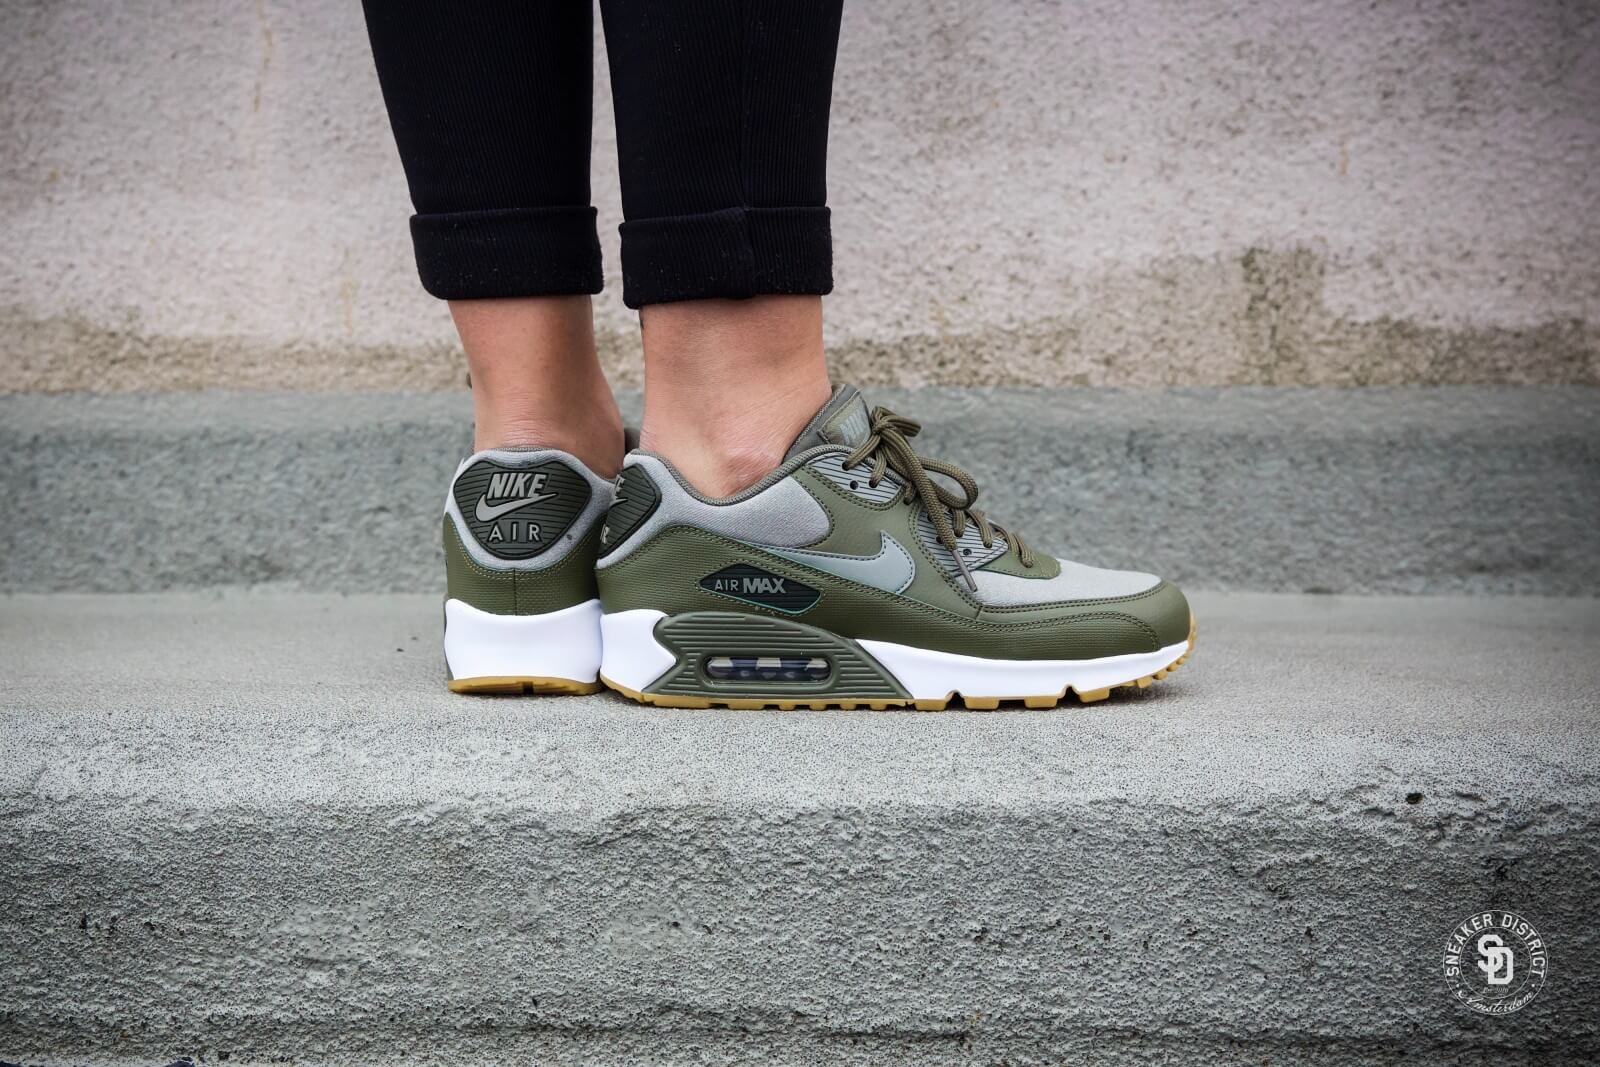 Nike Women's Air Max 90 Medium Olive/Dark Stucco